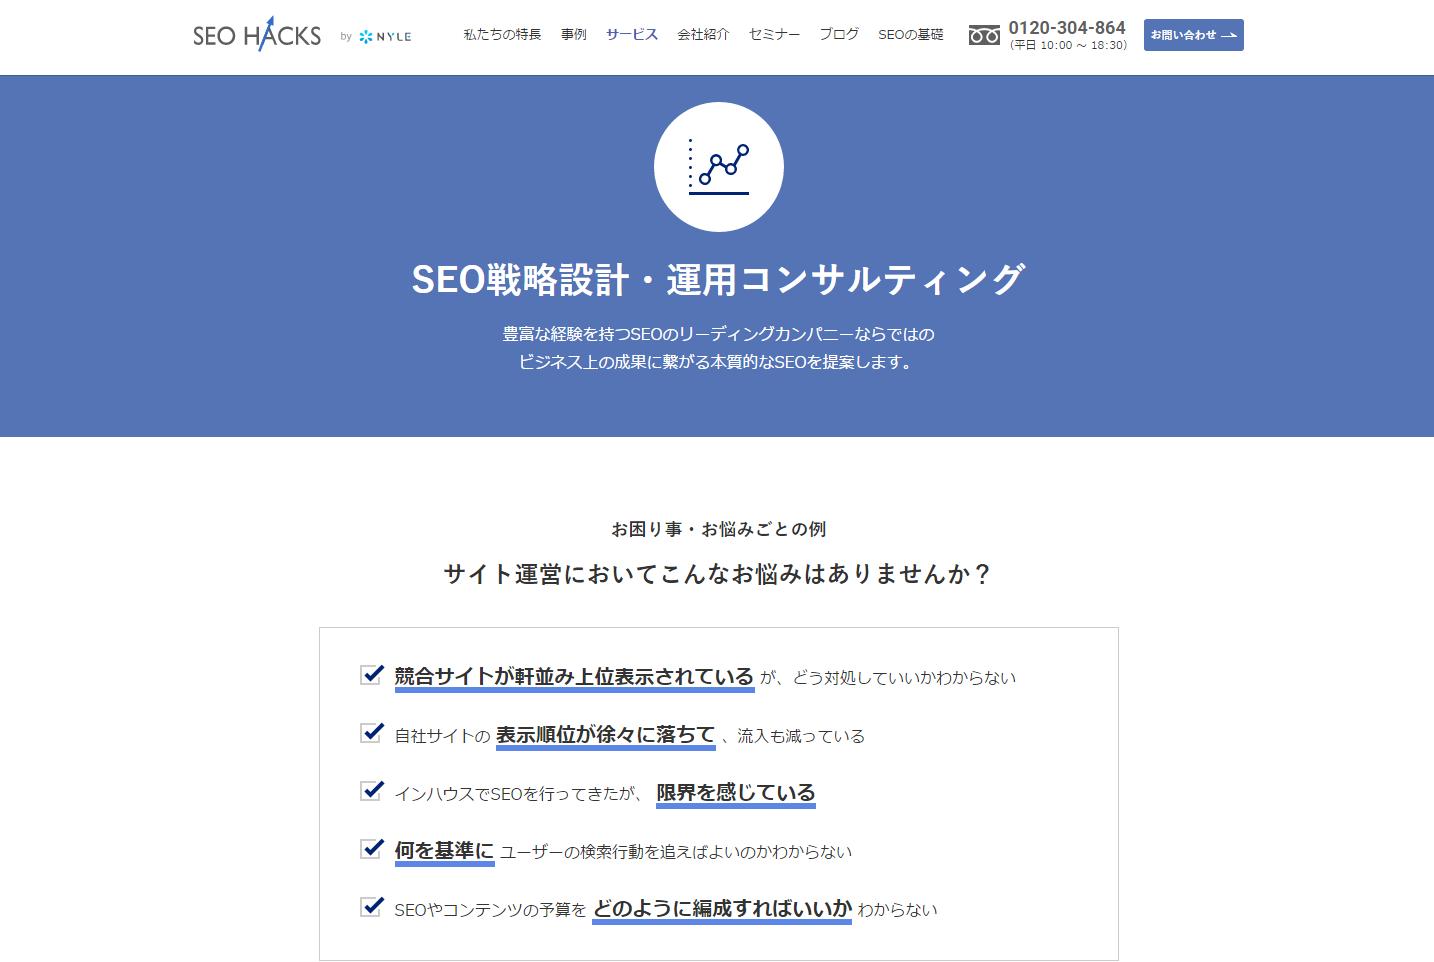 SEO HACKSのサービス情報